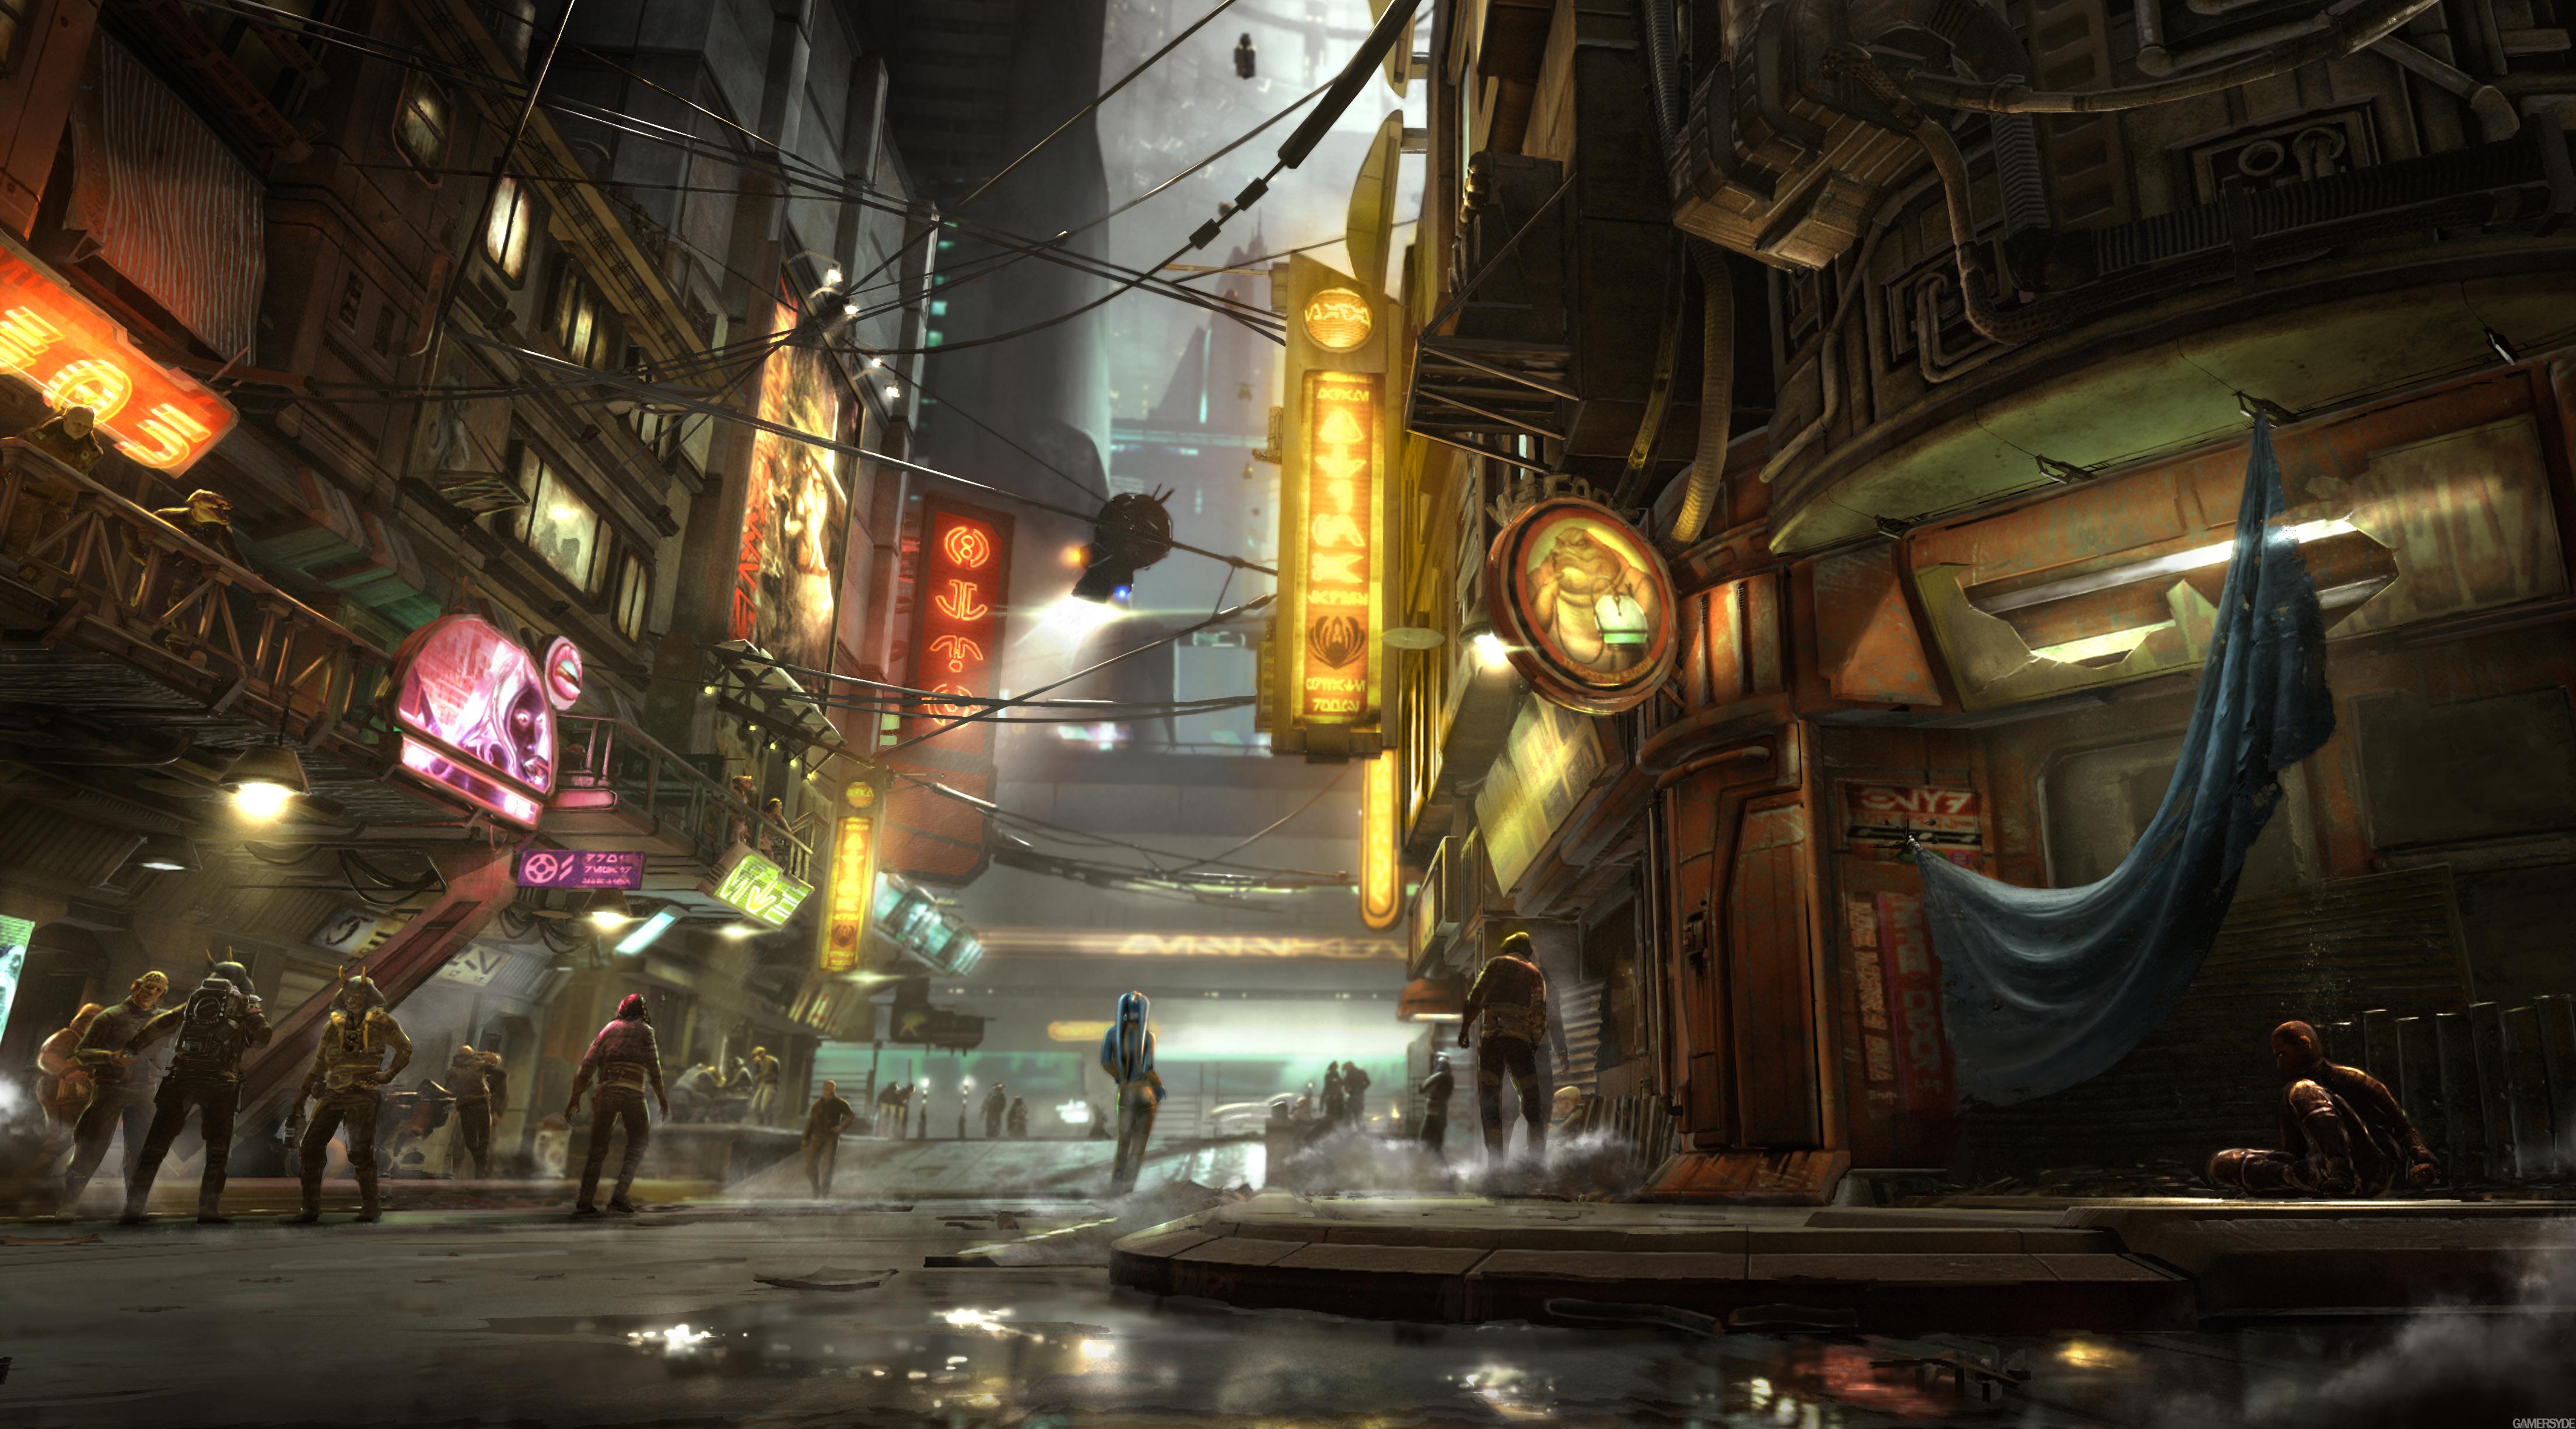 A trend that we will see in next gen- Cyberpunk/Futuristic ...